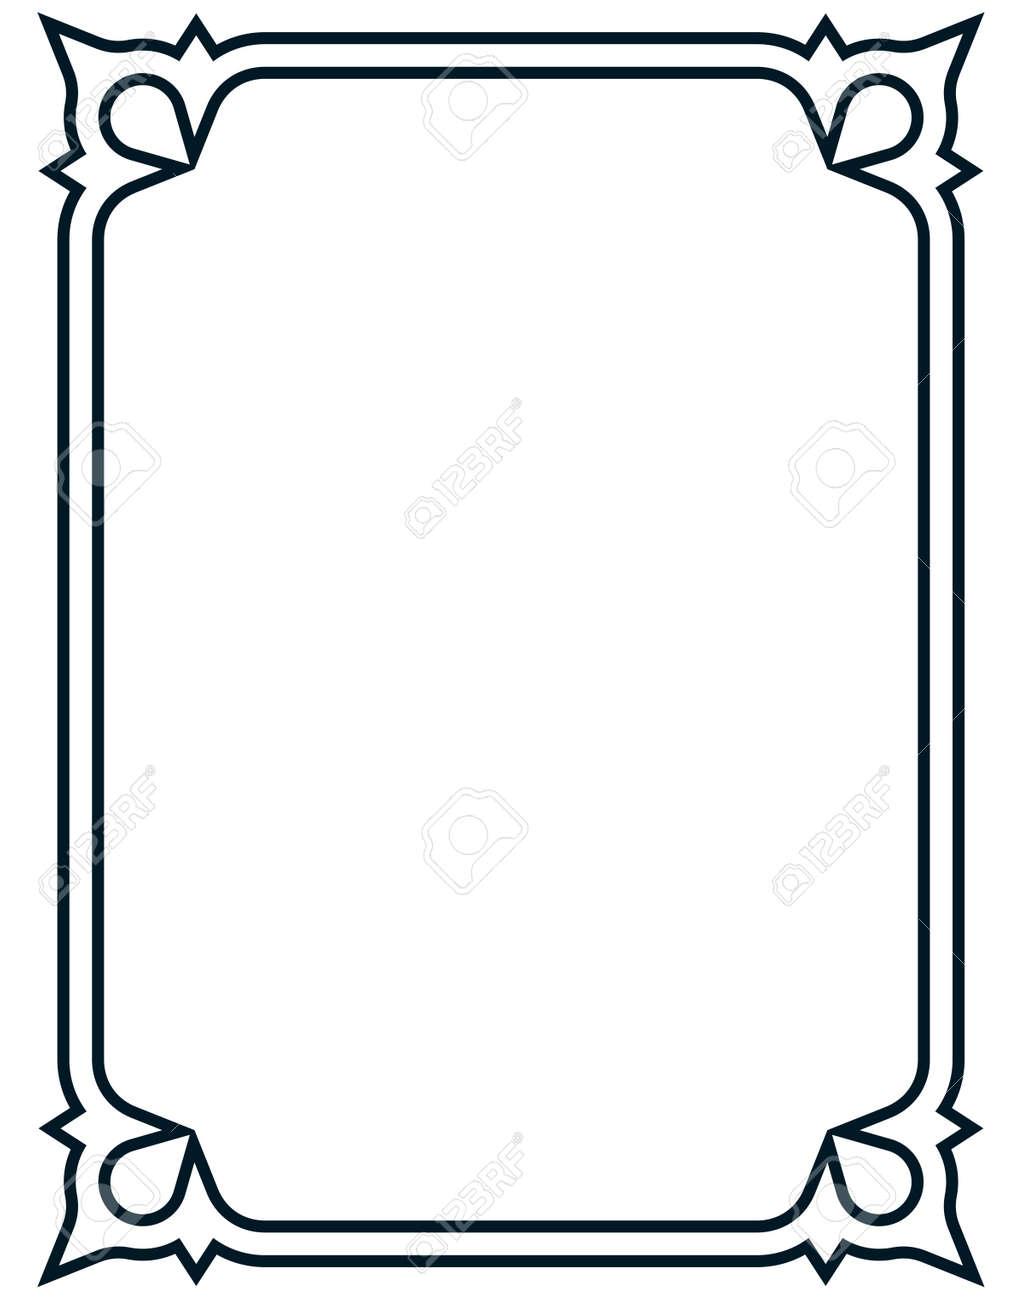 border frame deco vector art simple line corner royalty free rh 123rf com art deco vector art free art deco vector borders